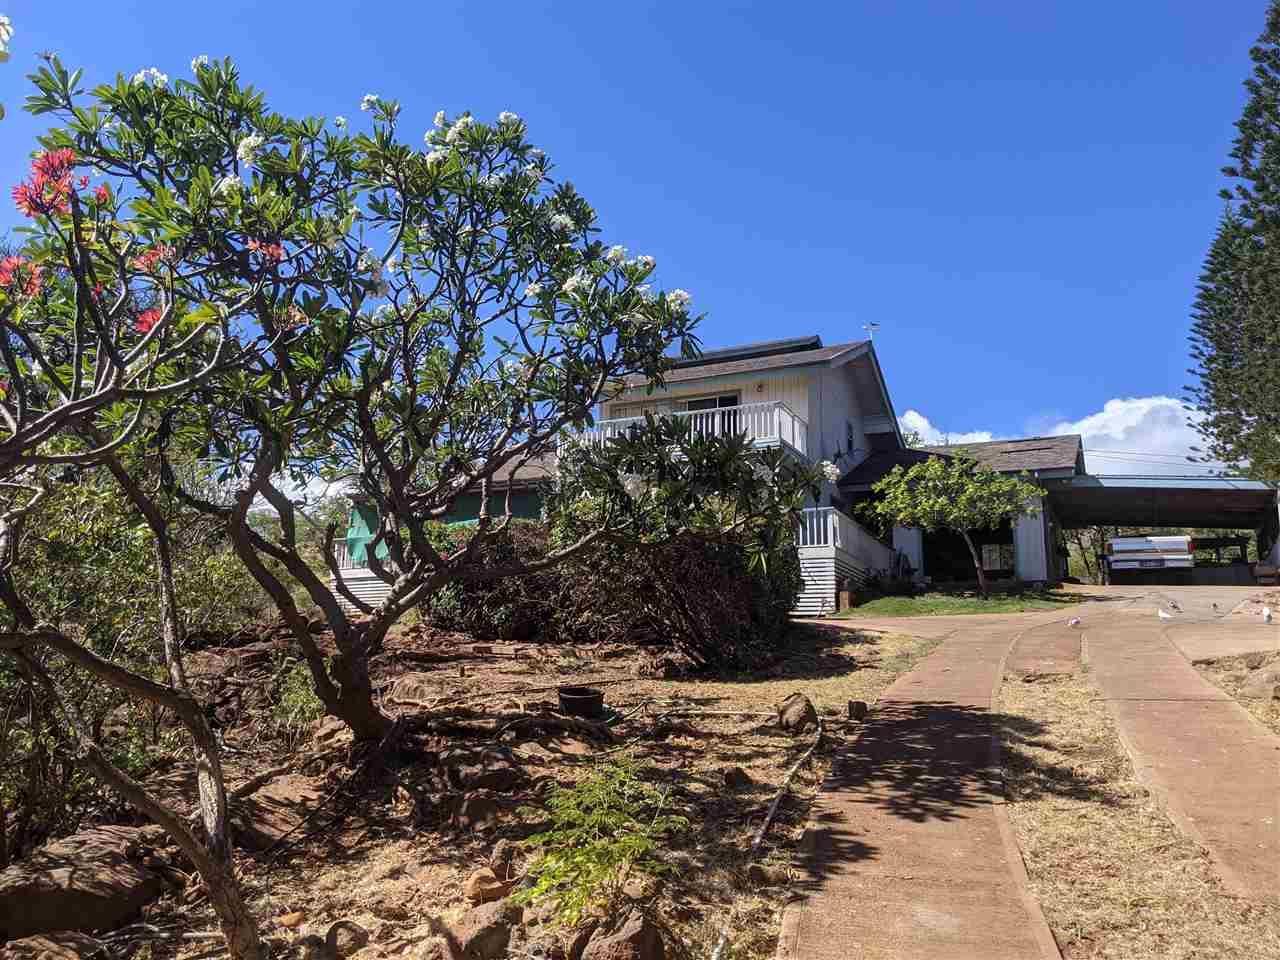 Photo of 361 Onioni Dr #Lot 44, Kaunakakai, HI 96748 (MLS # 391840)